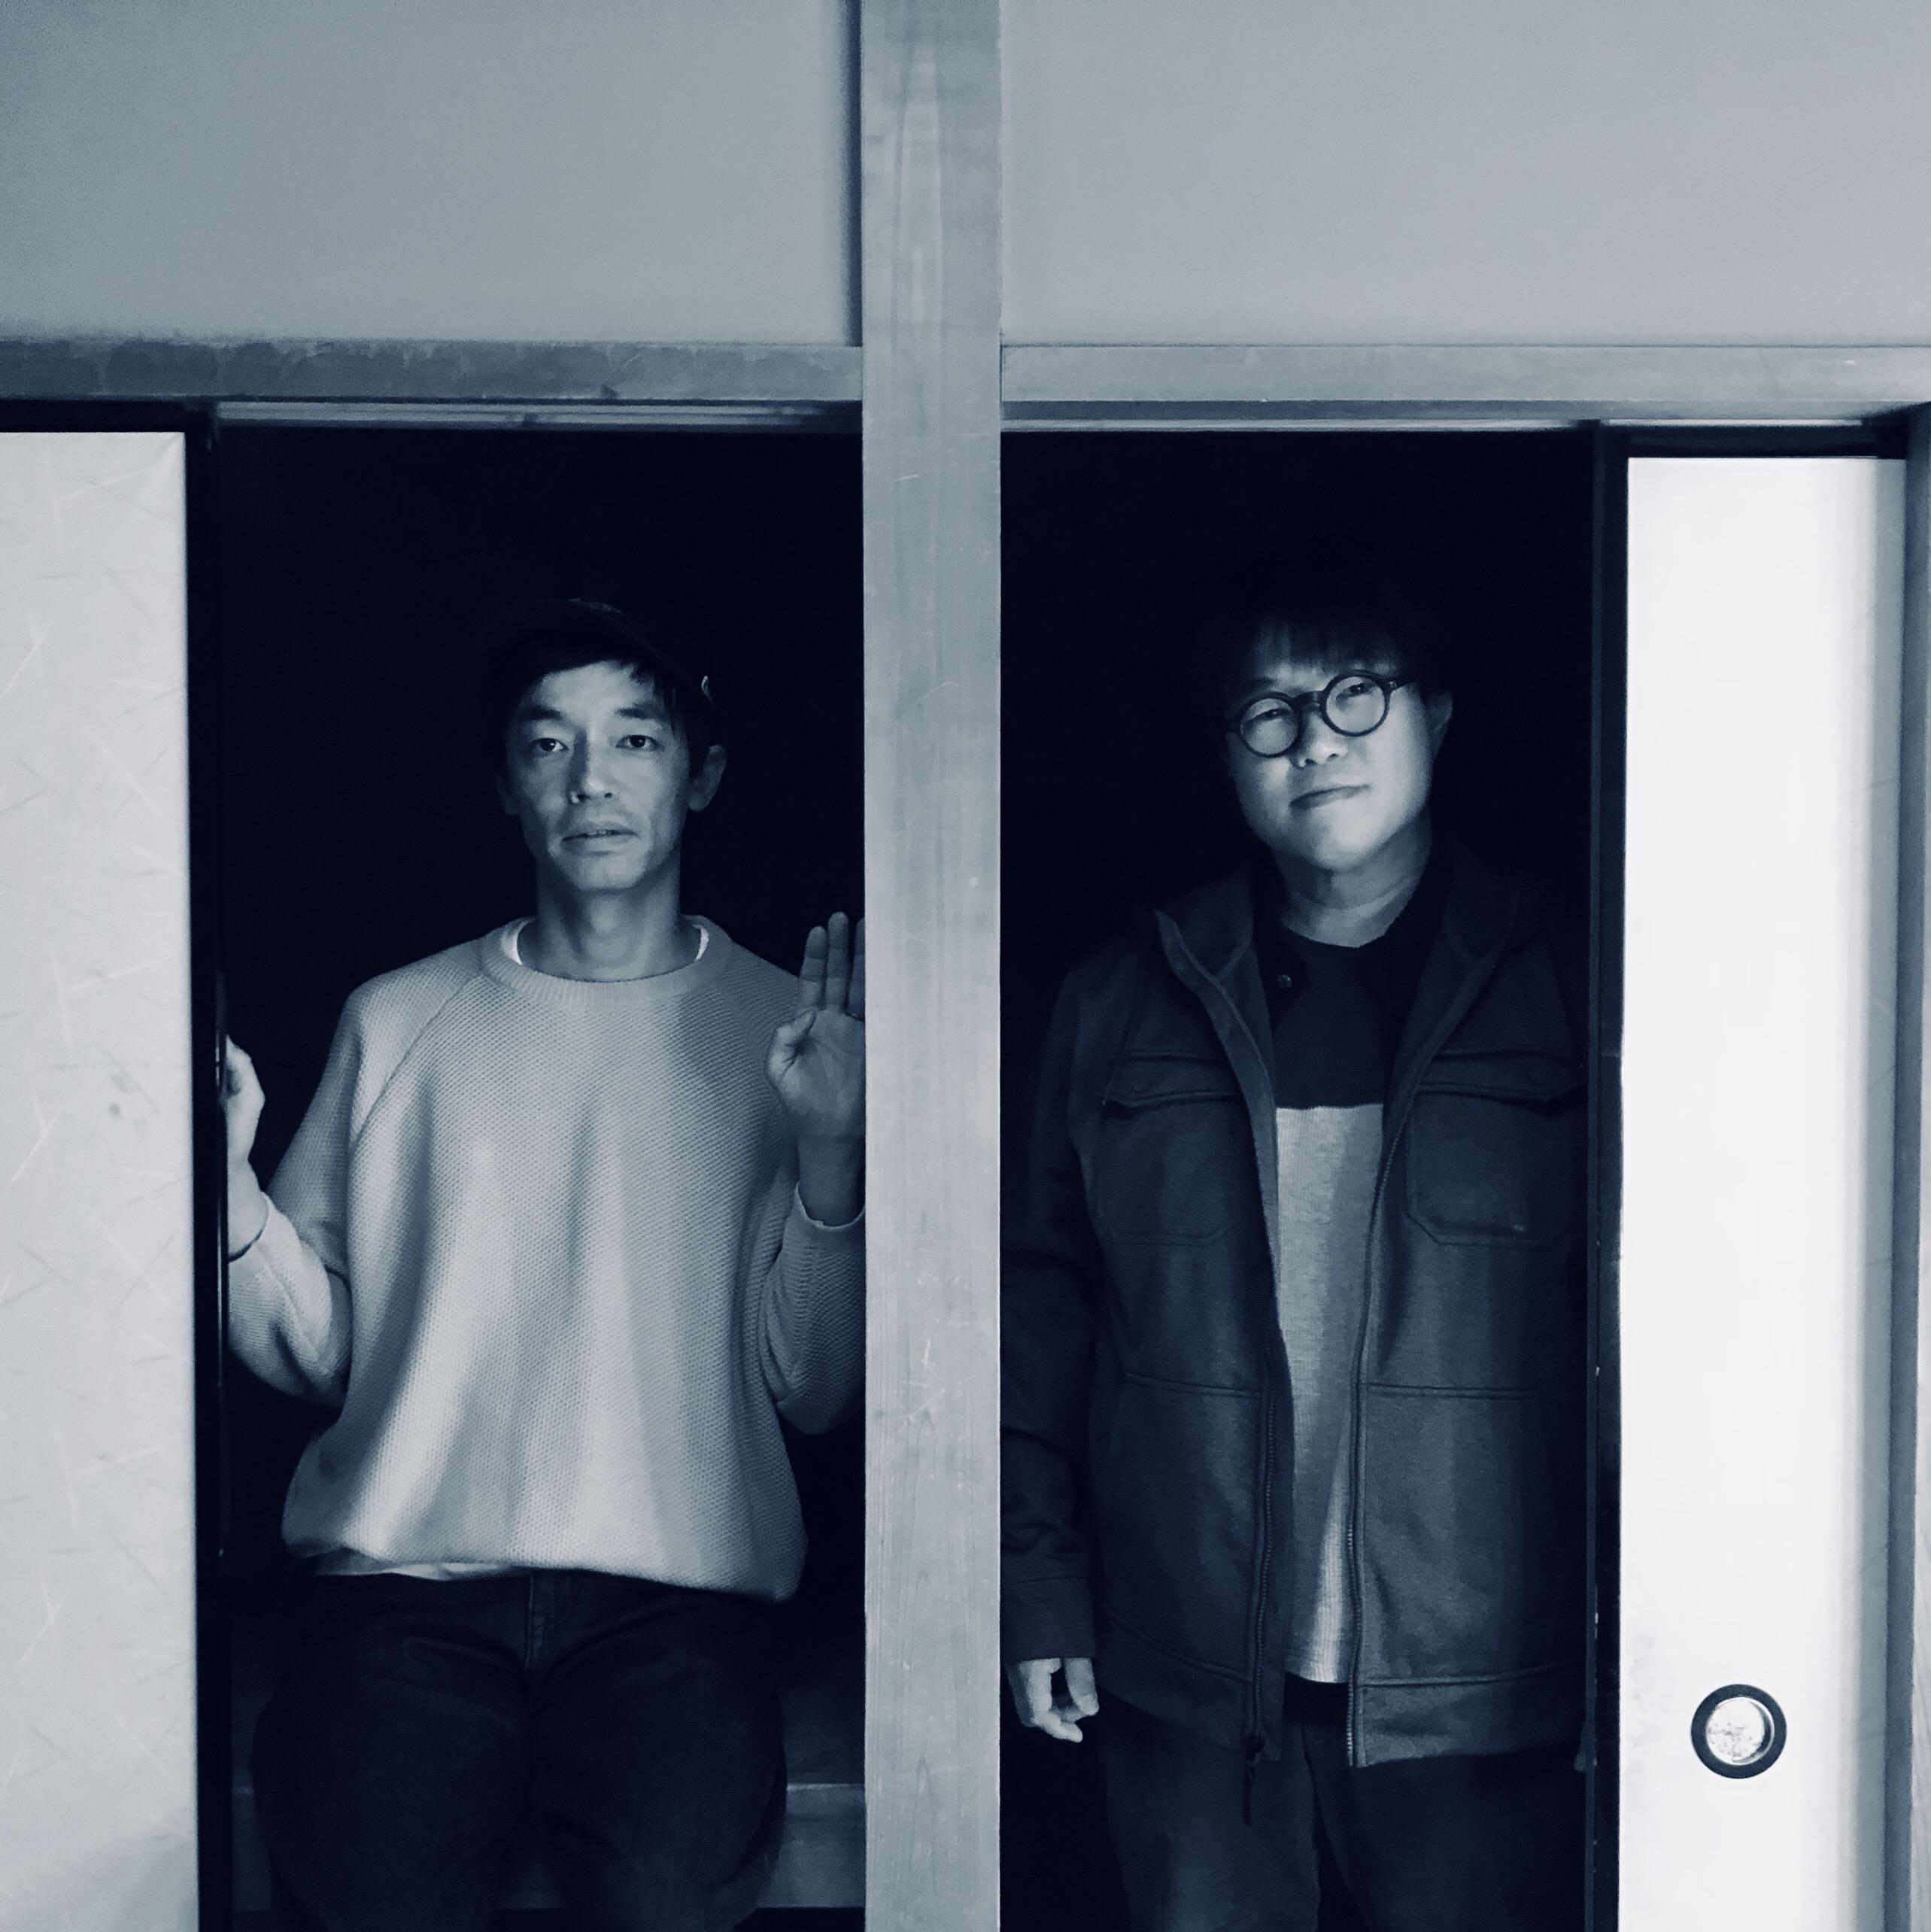 2019年6月8日(土) 武嶋聡×小林創 DUO